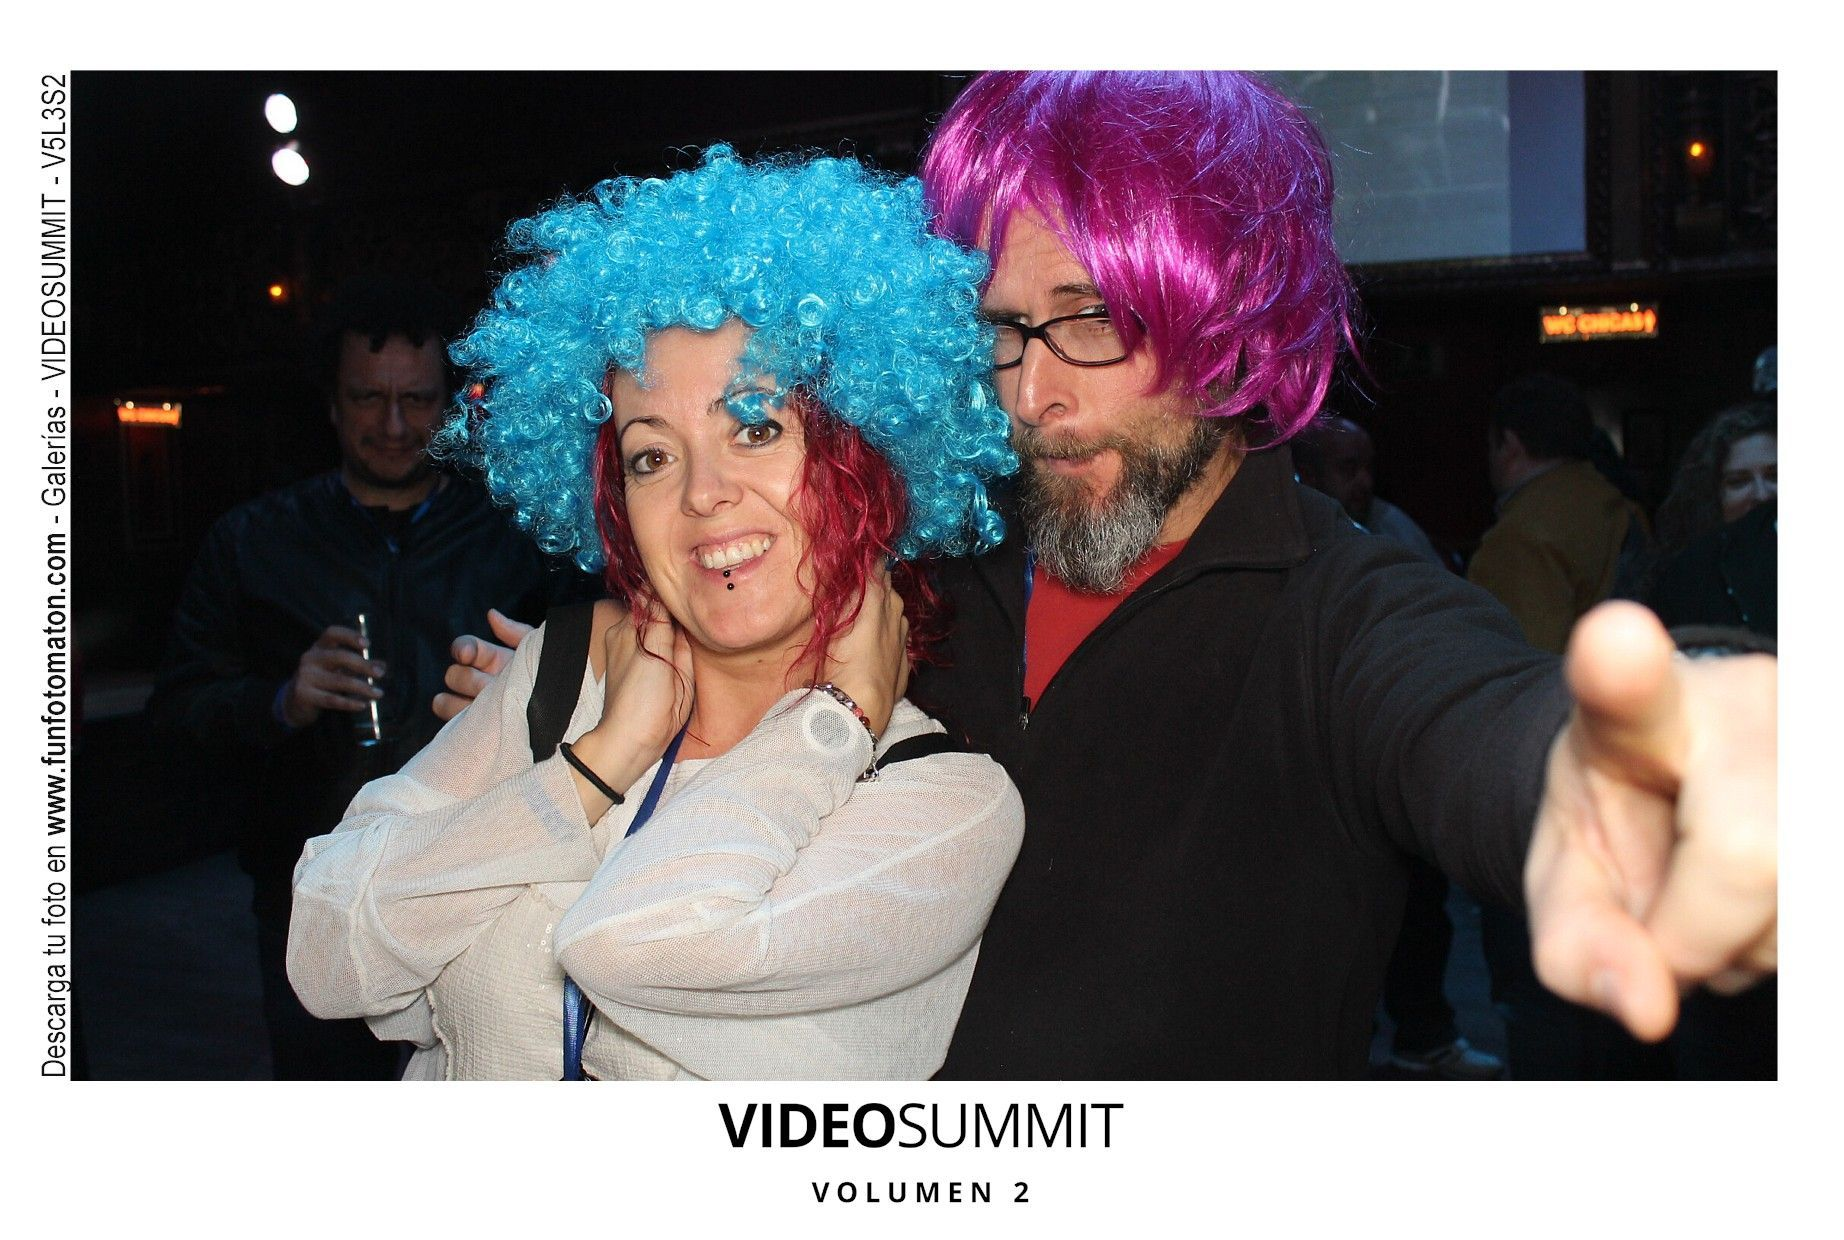 videosummit-vol2-club-party-054